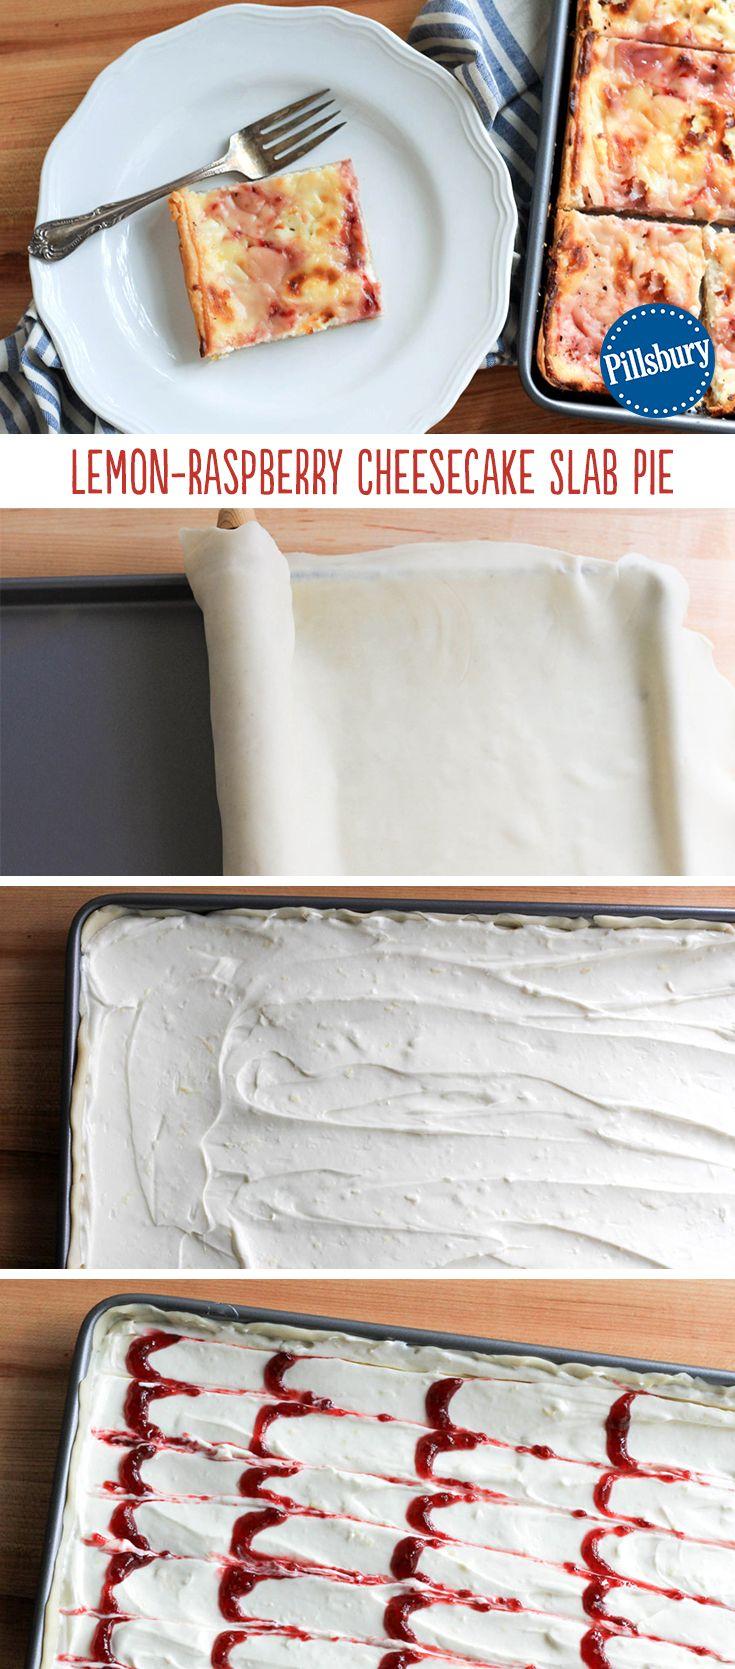 Lemon-Raspberry Cheesecake Slab Pie | Recipe | Baby ...